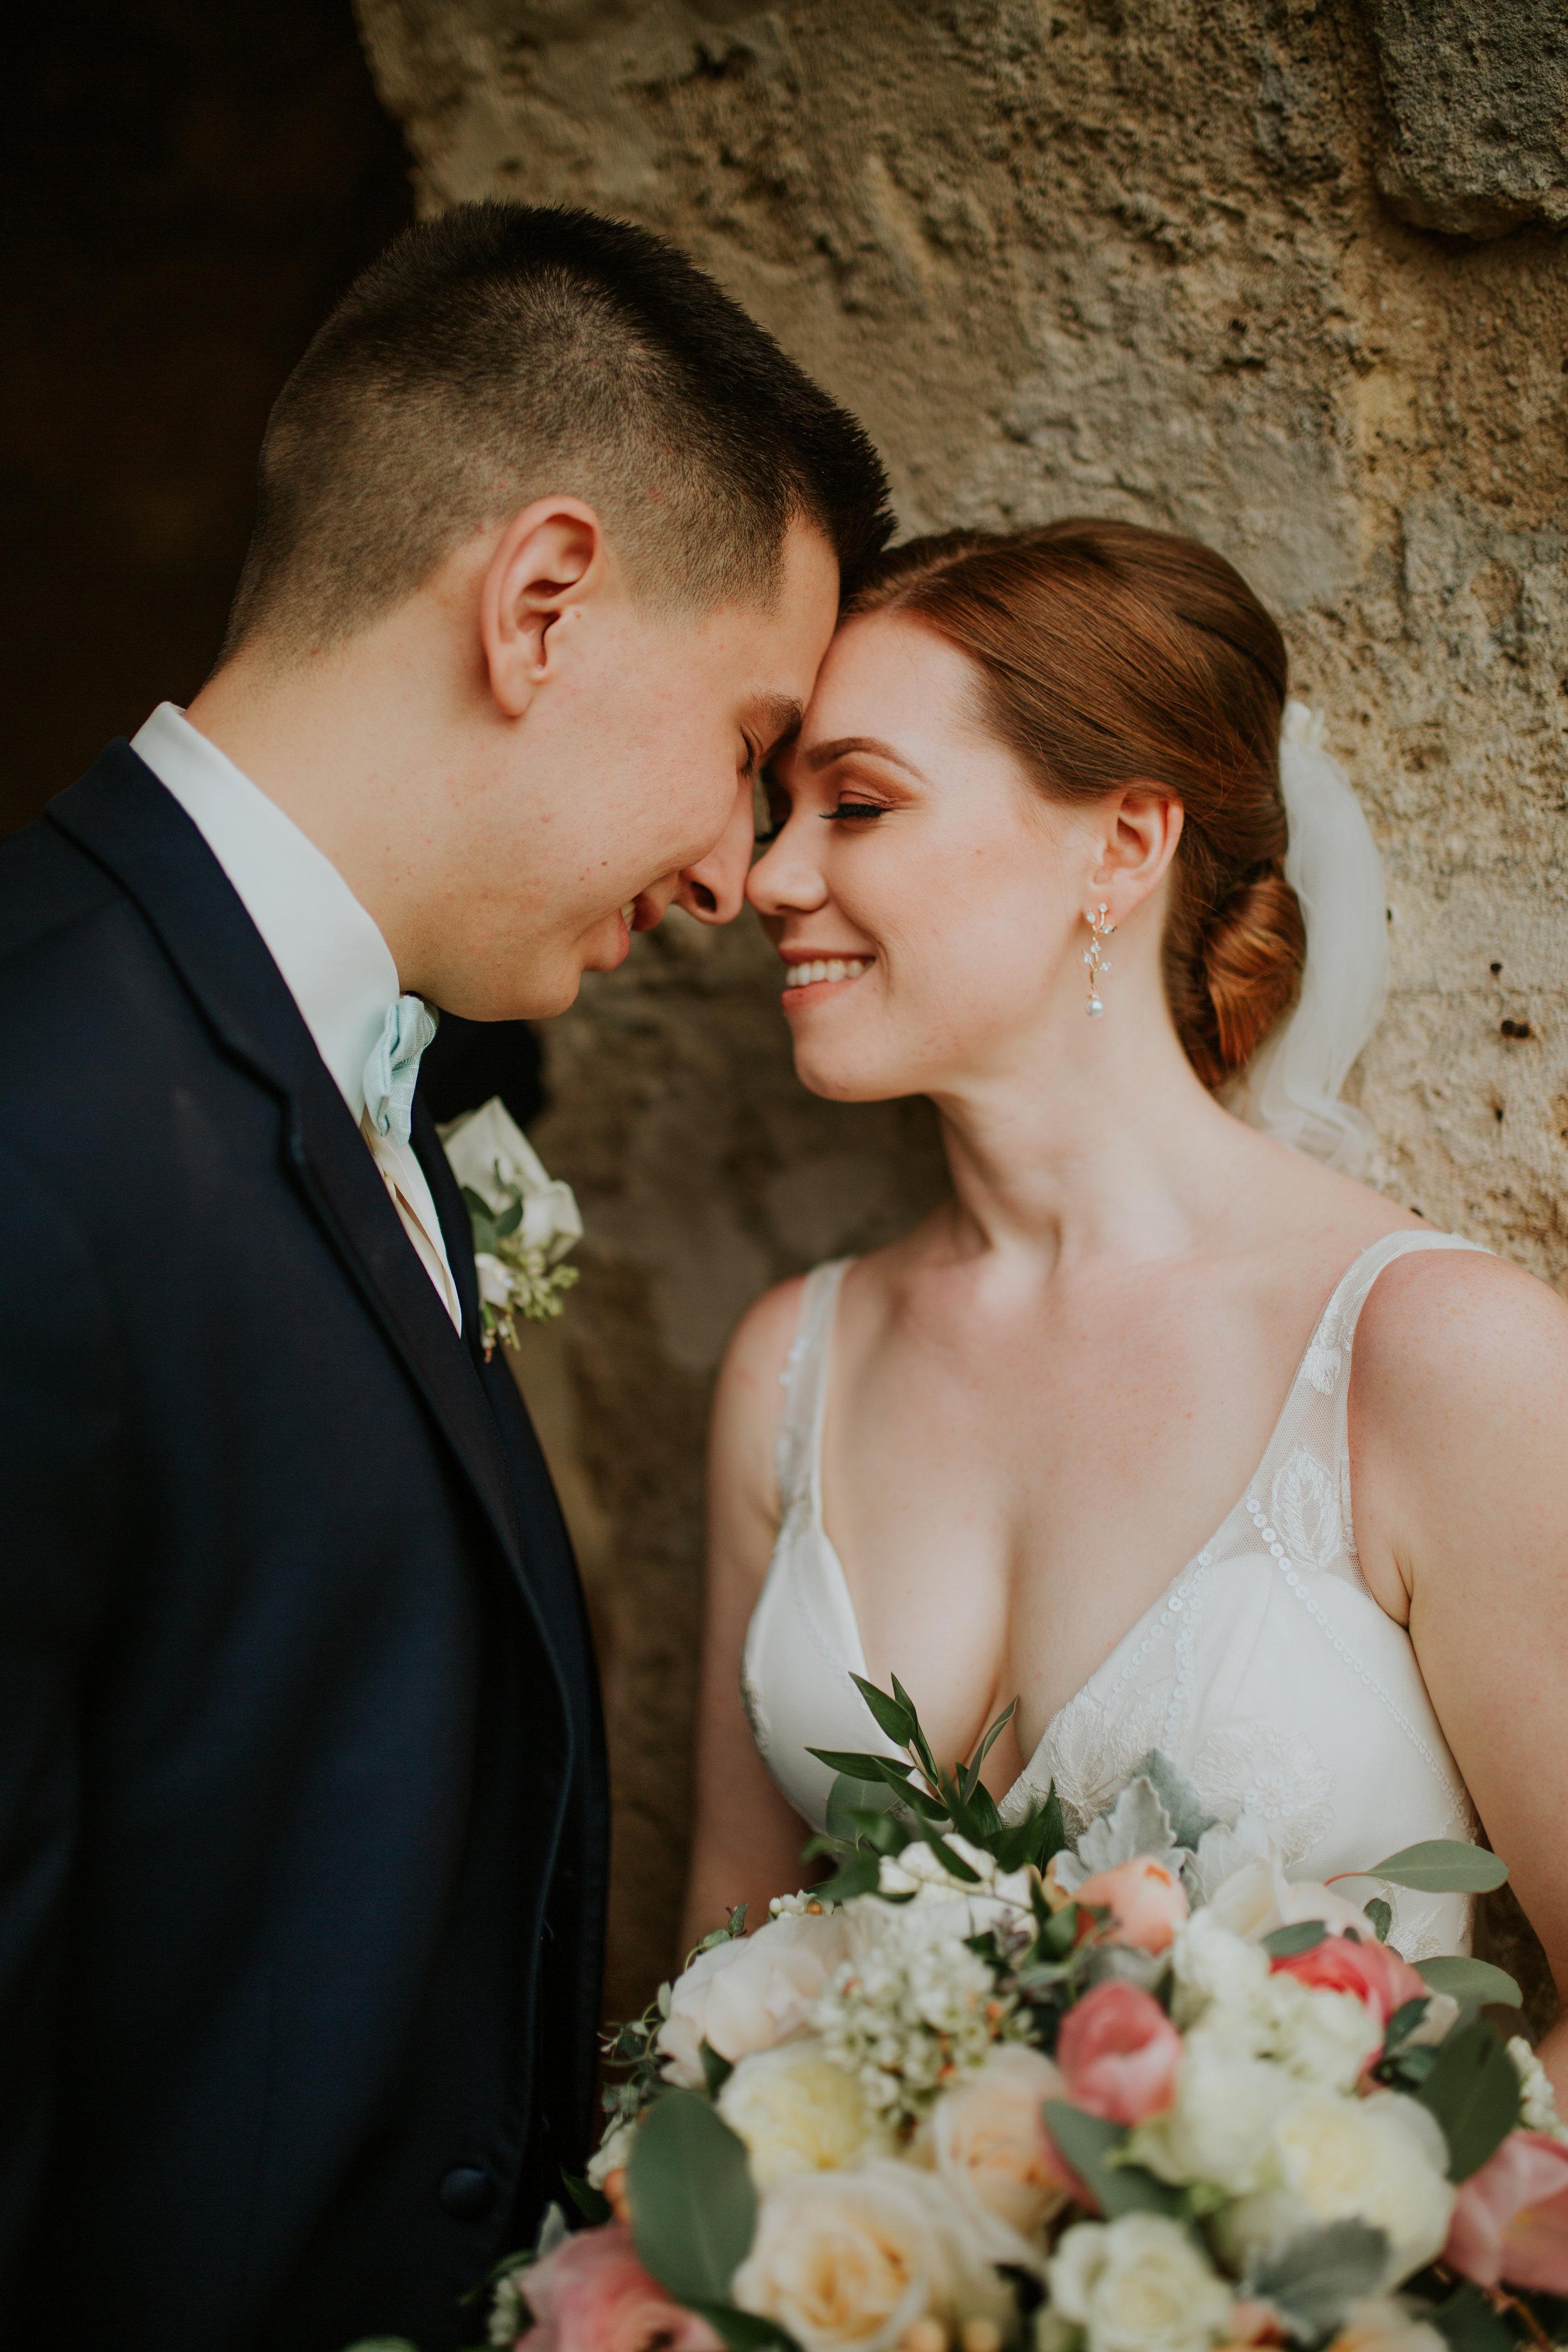 Jenna + Brandon  Mission concepcion + Sunset Station Wedding ↠